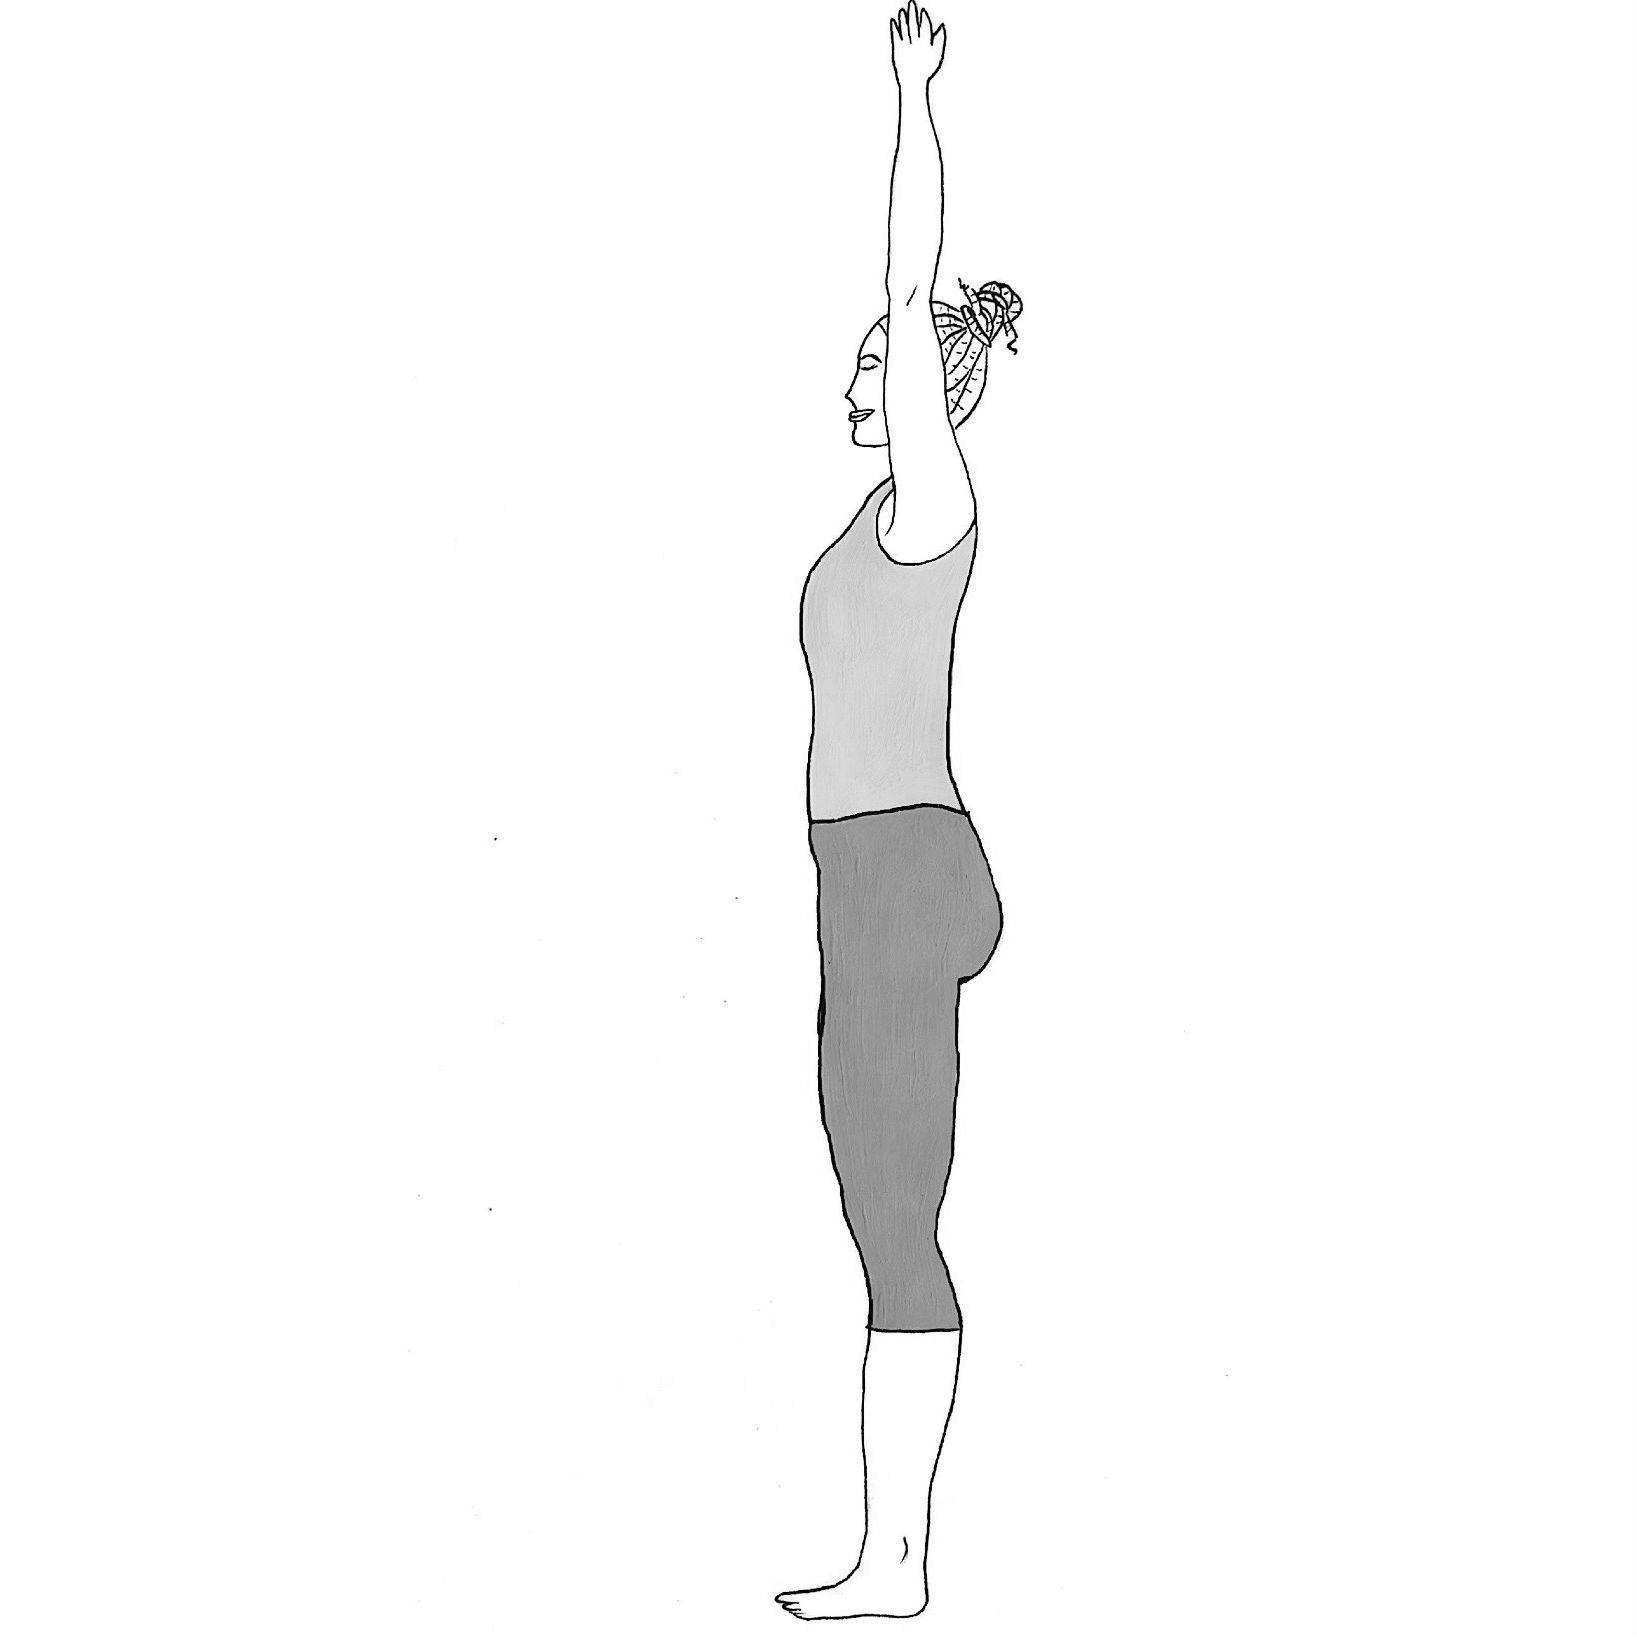 Upward Salute - Urdhva Hastasana/Vrikshasana